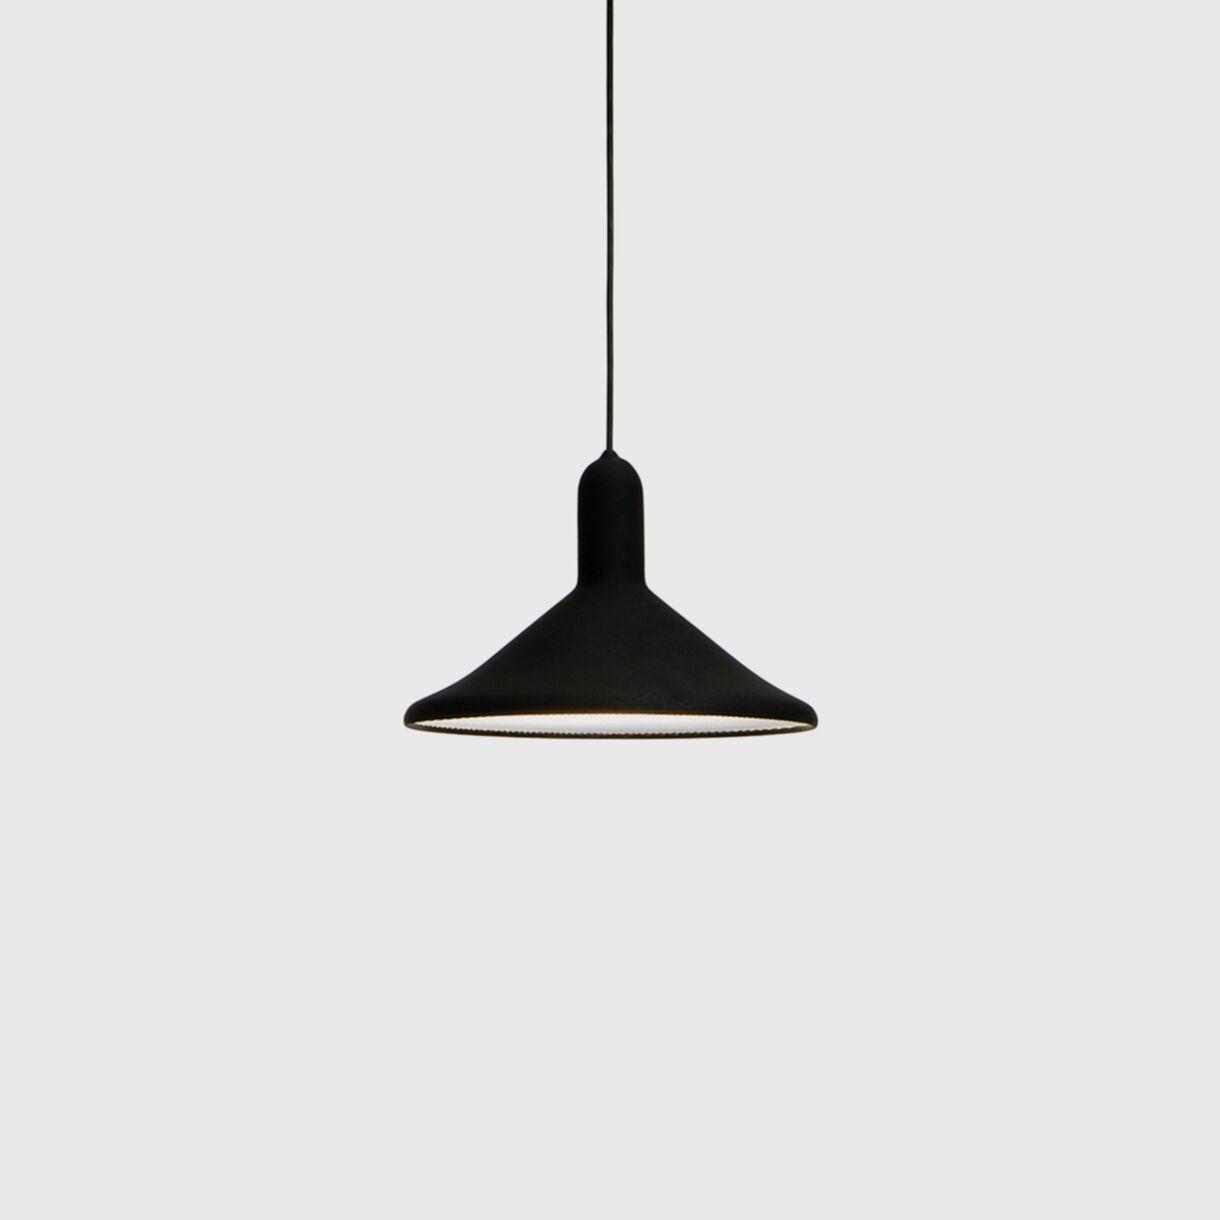 Torch Light, S3 Cone, Black